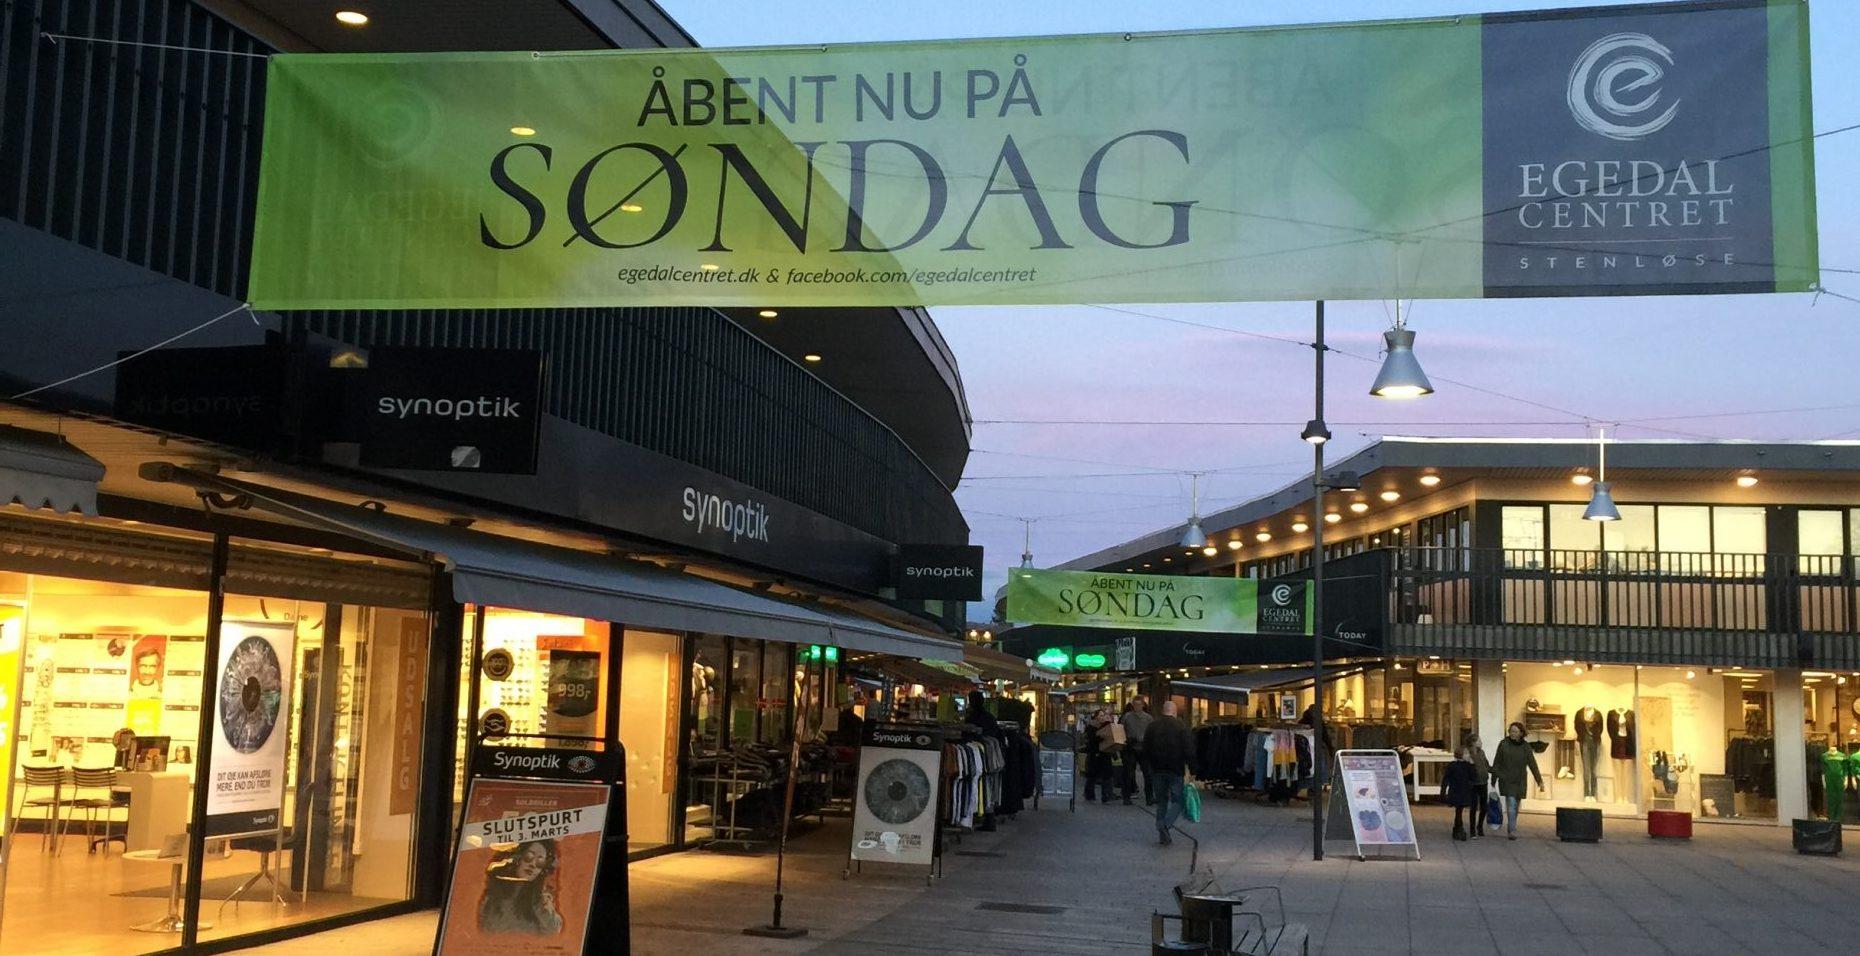 Husk Søndagsåbent i Egedal Centret den 4. august